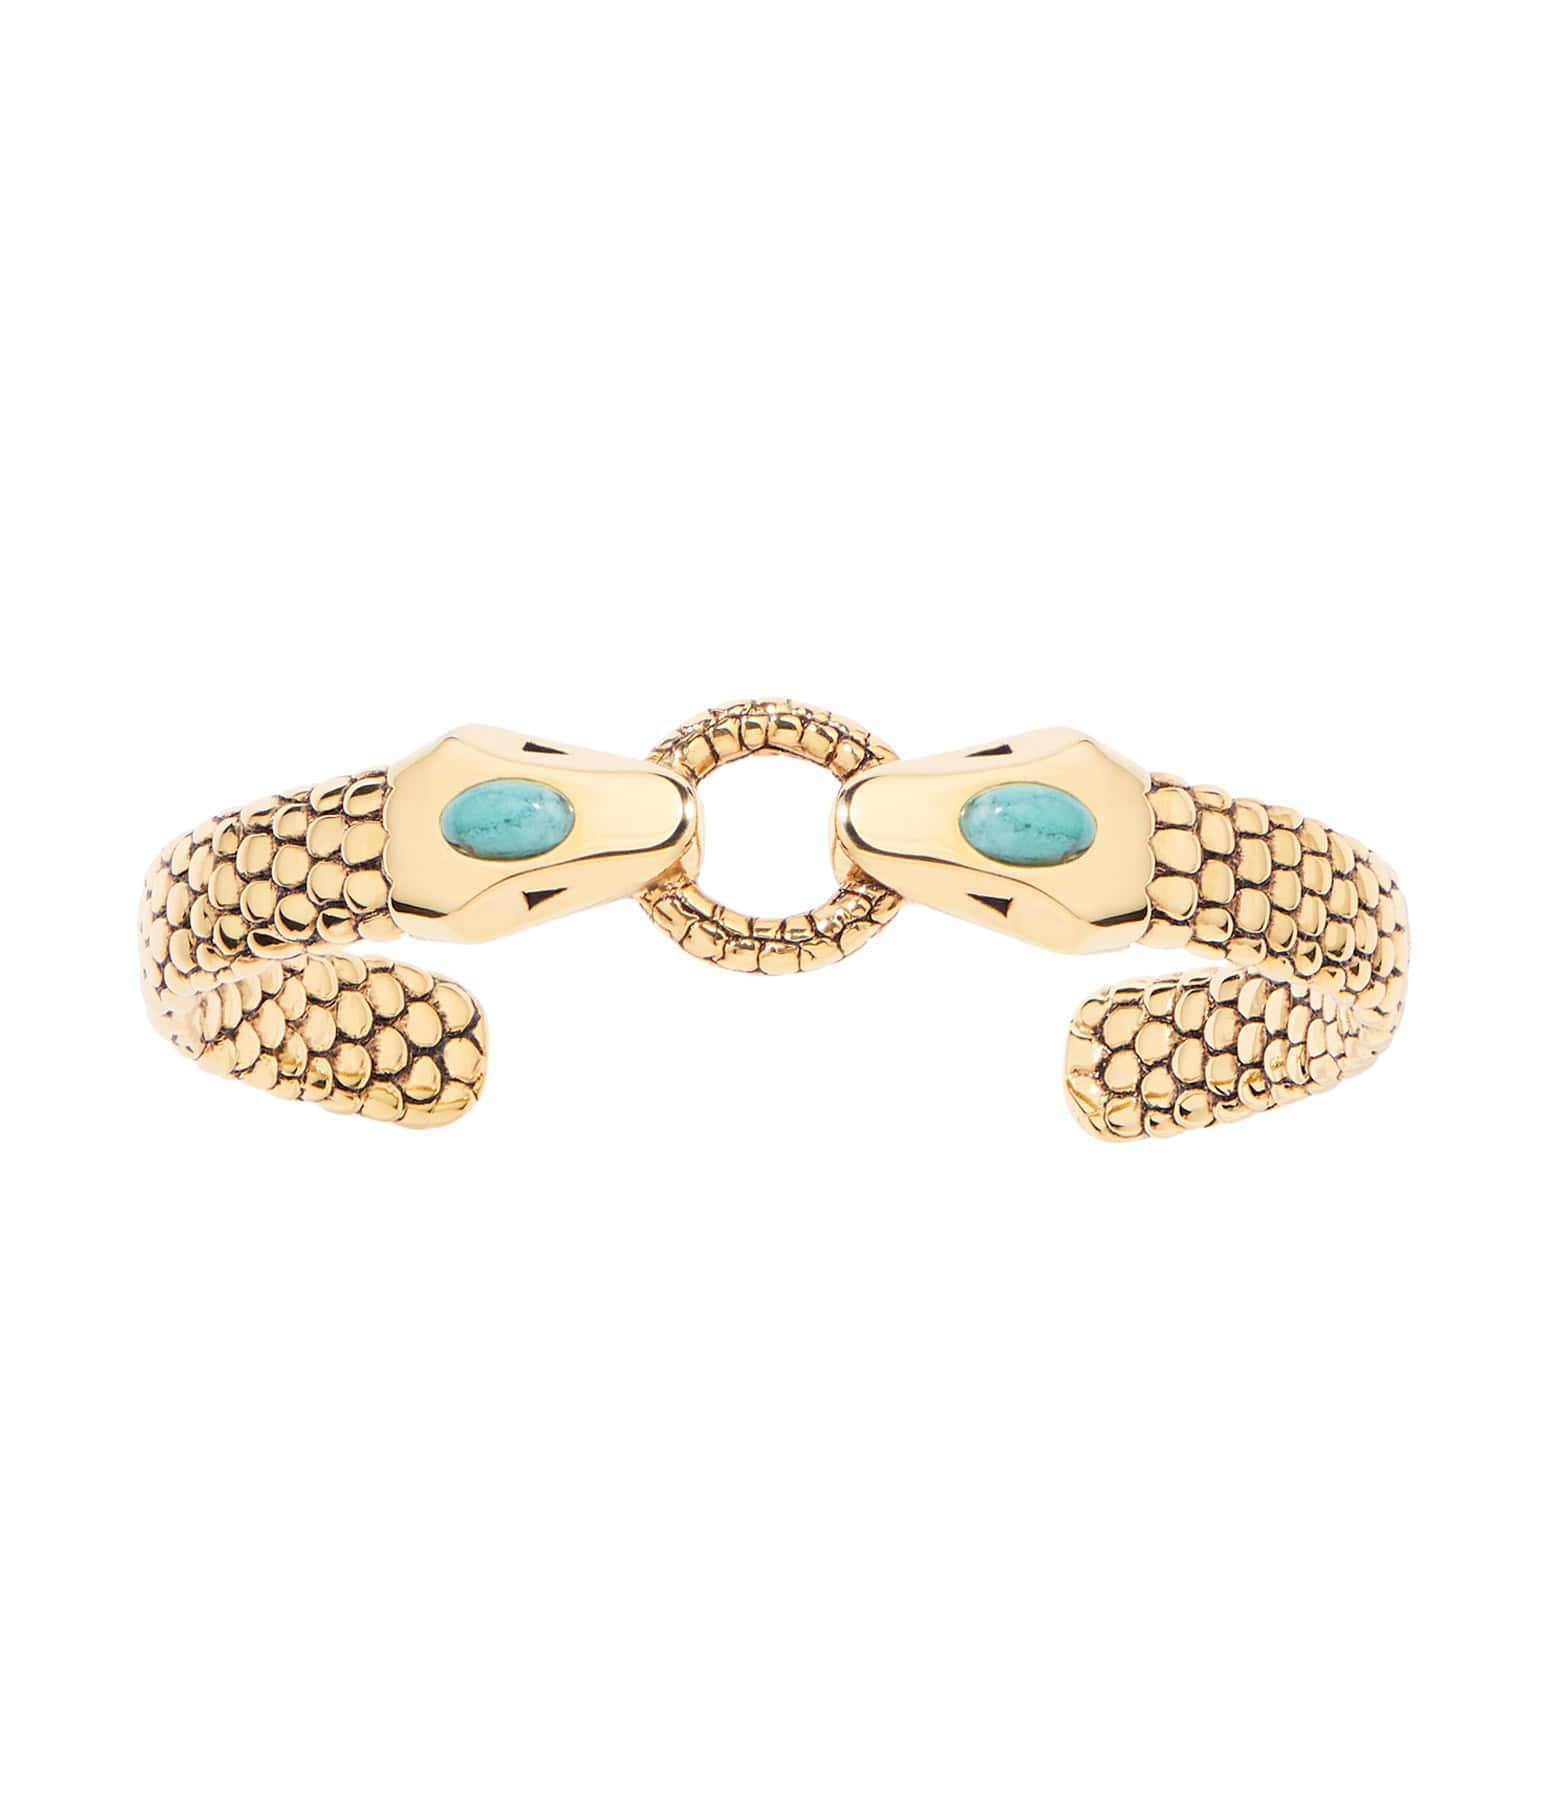 AURELIE BIDERMANN - Bracelet Tao Turquoise Plaqué Or